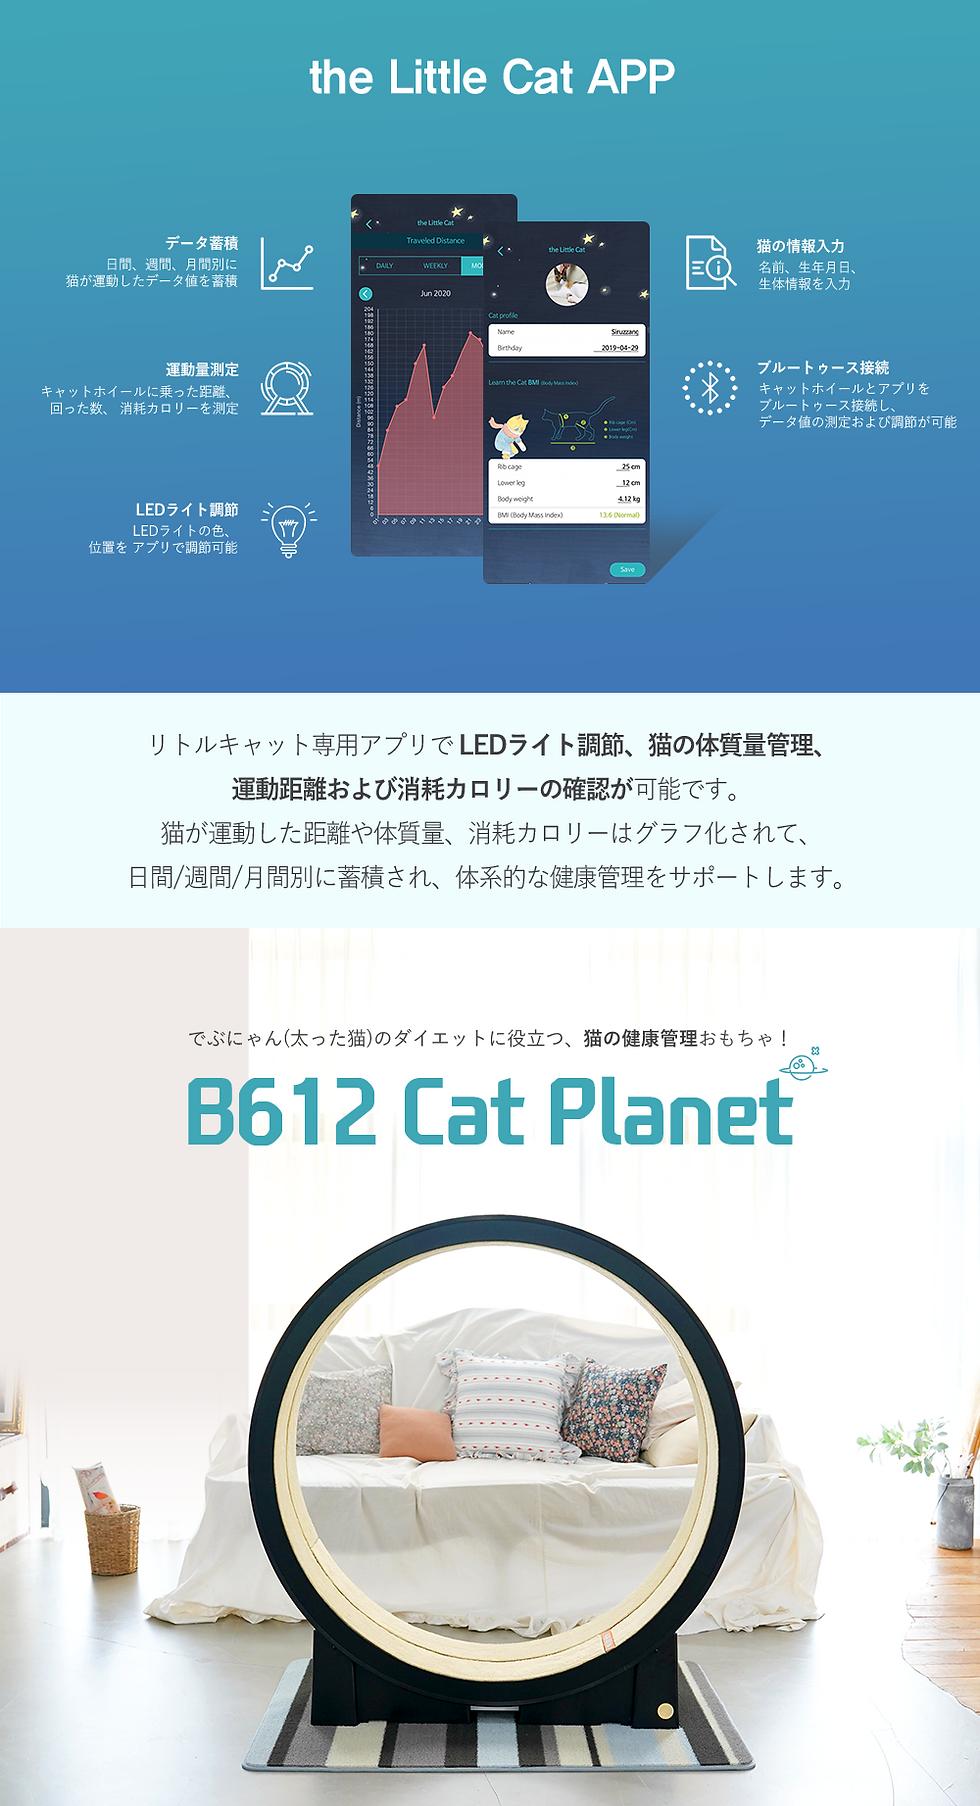 japan_detail__03.png